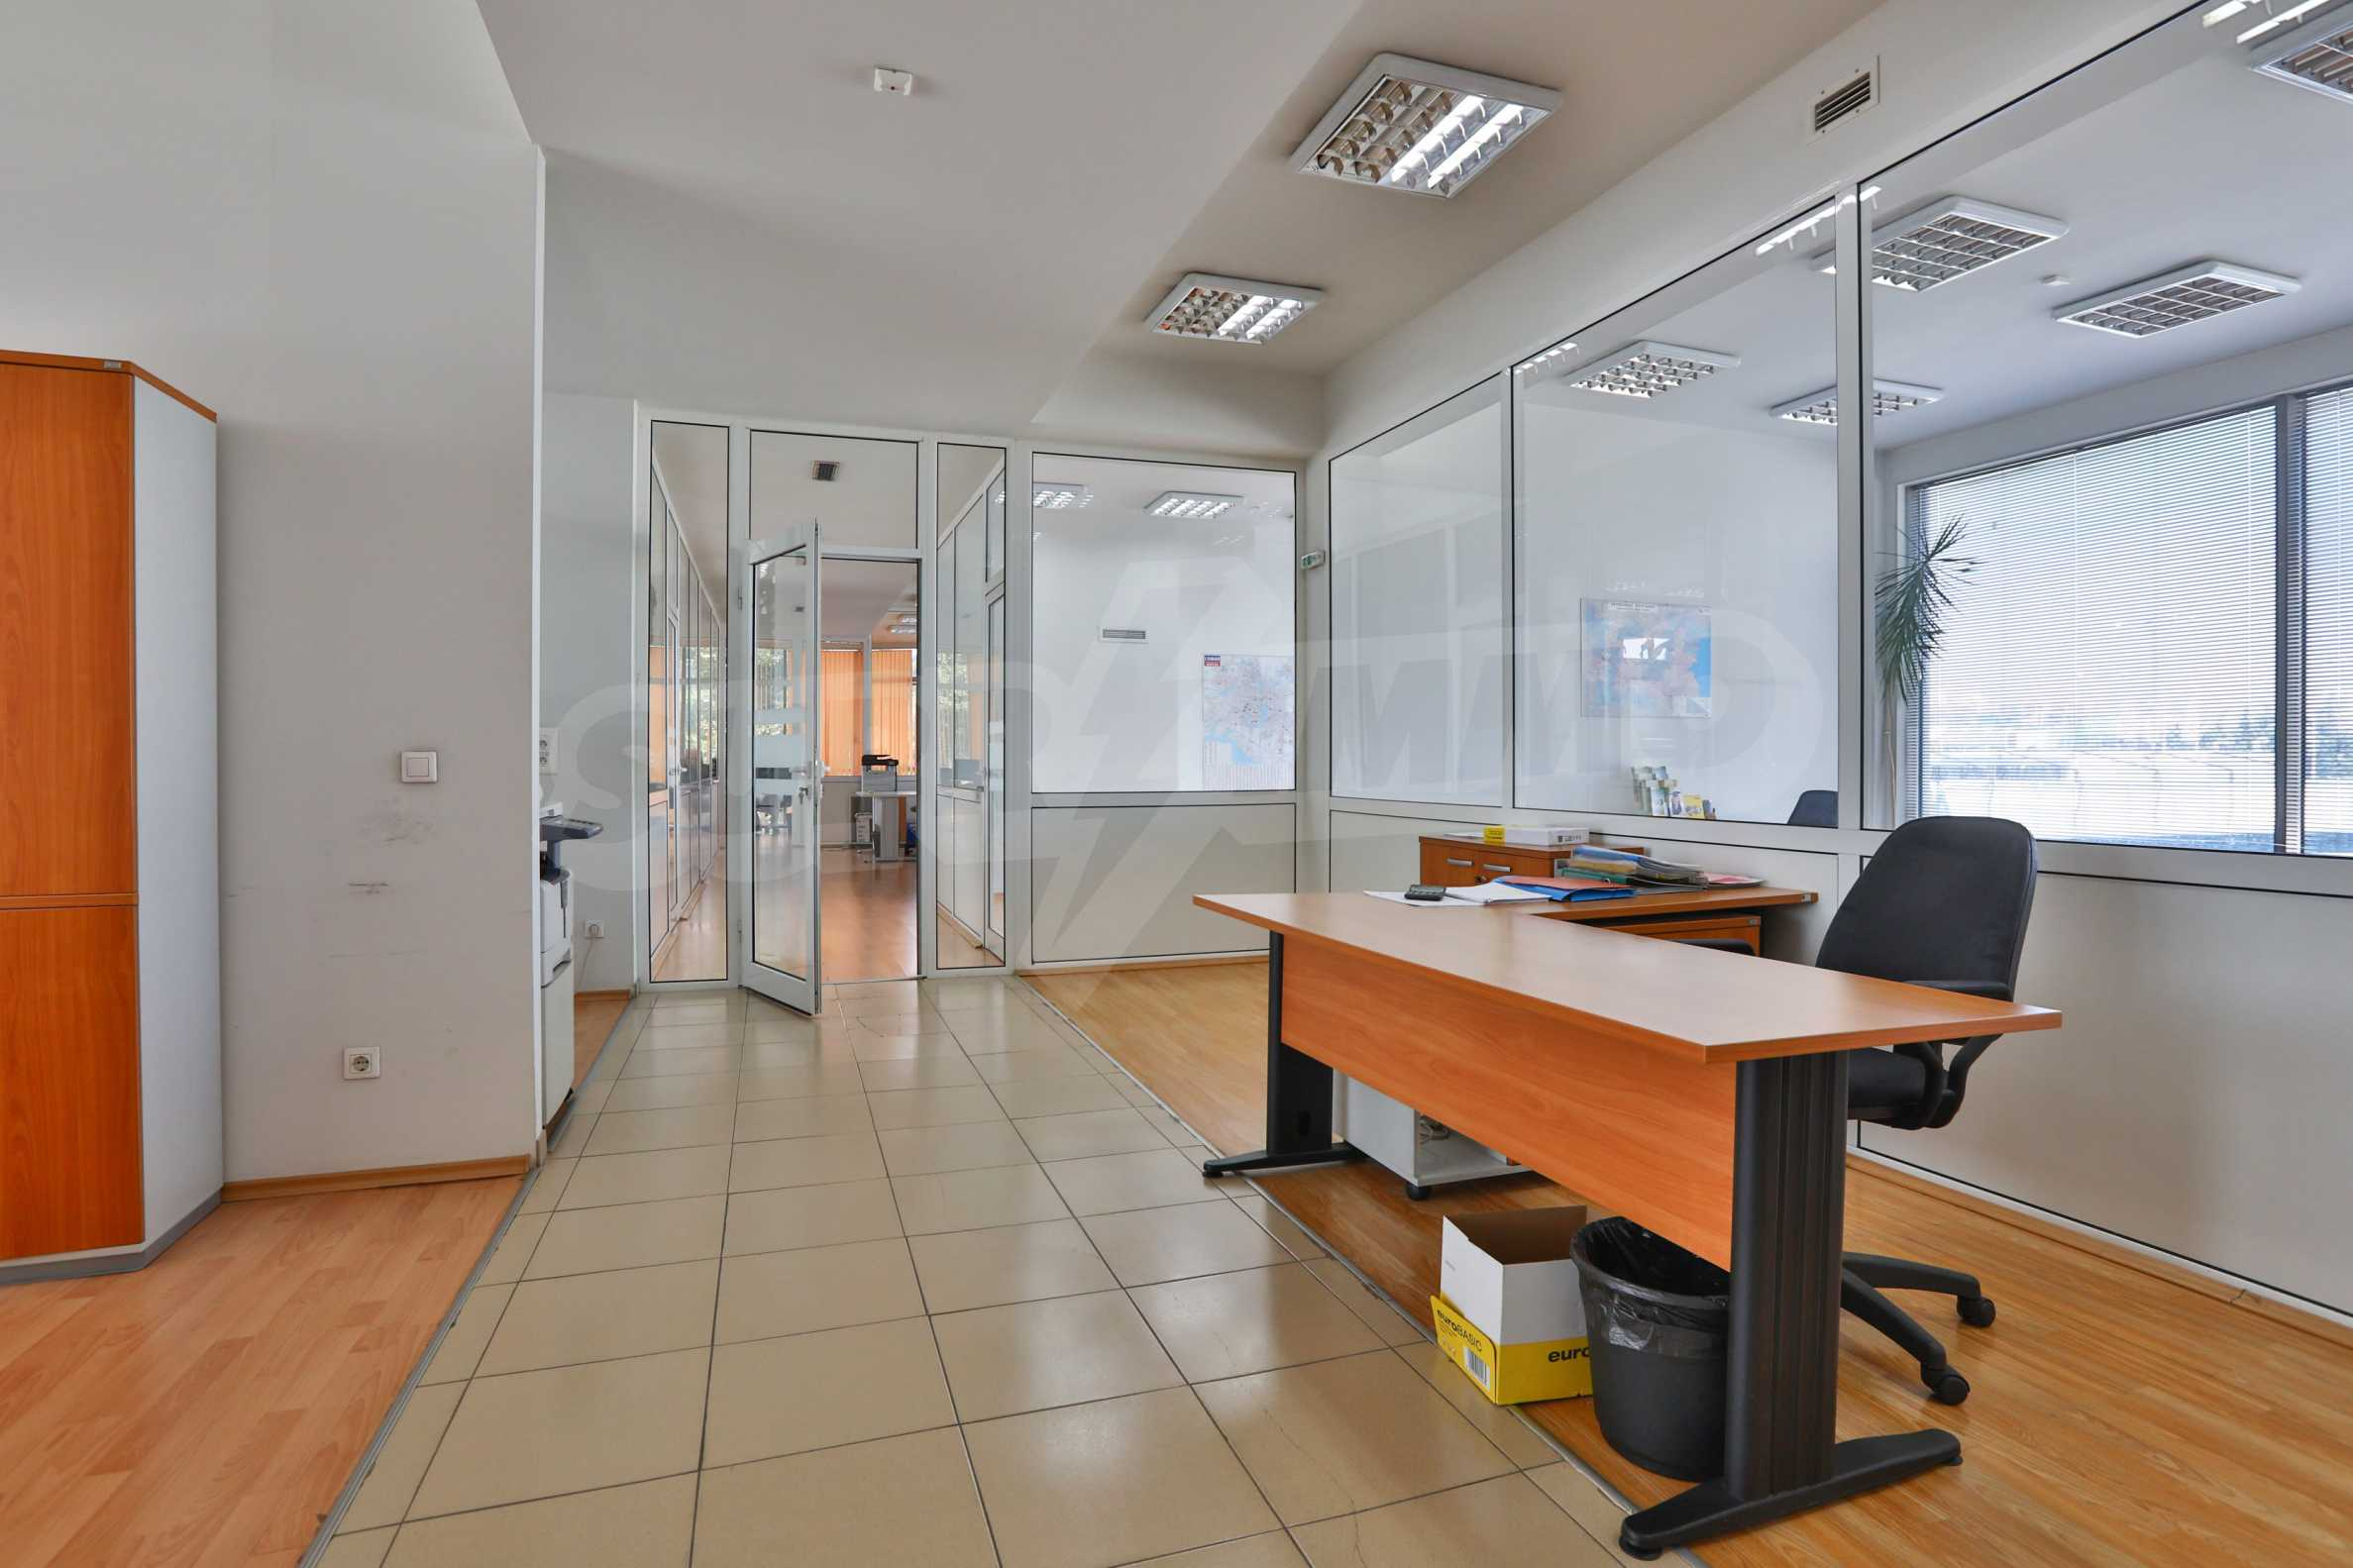 Офис в бизнес сграда висок клас на бул. Цариградско шосе 33